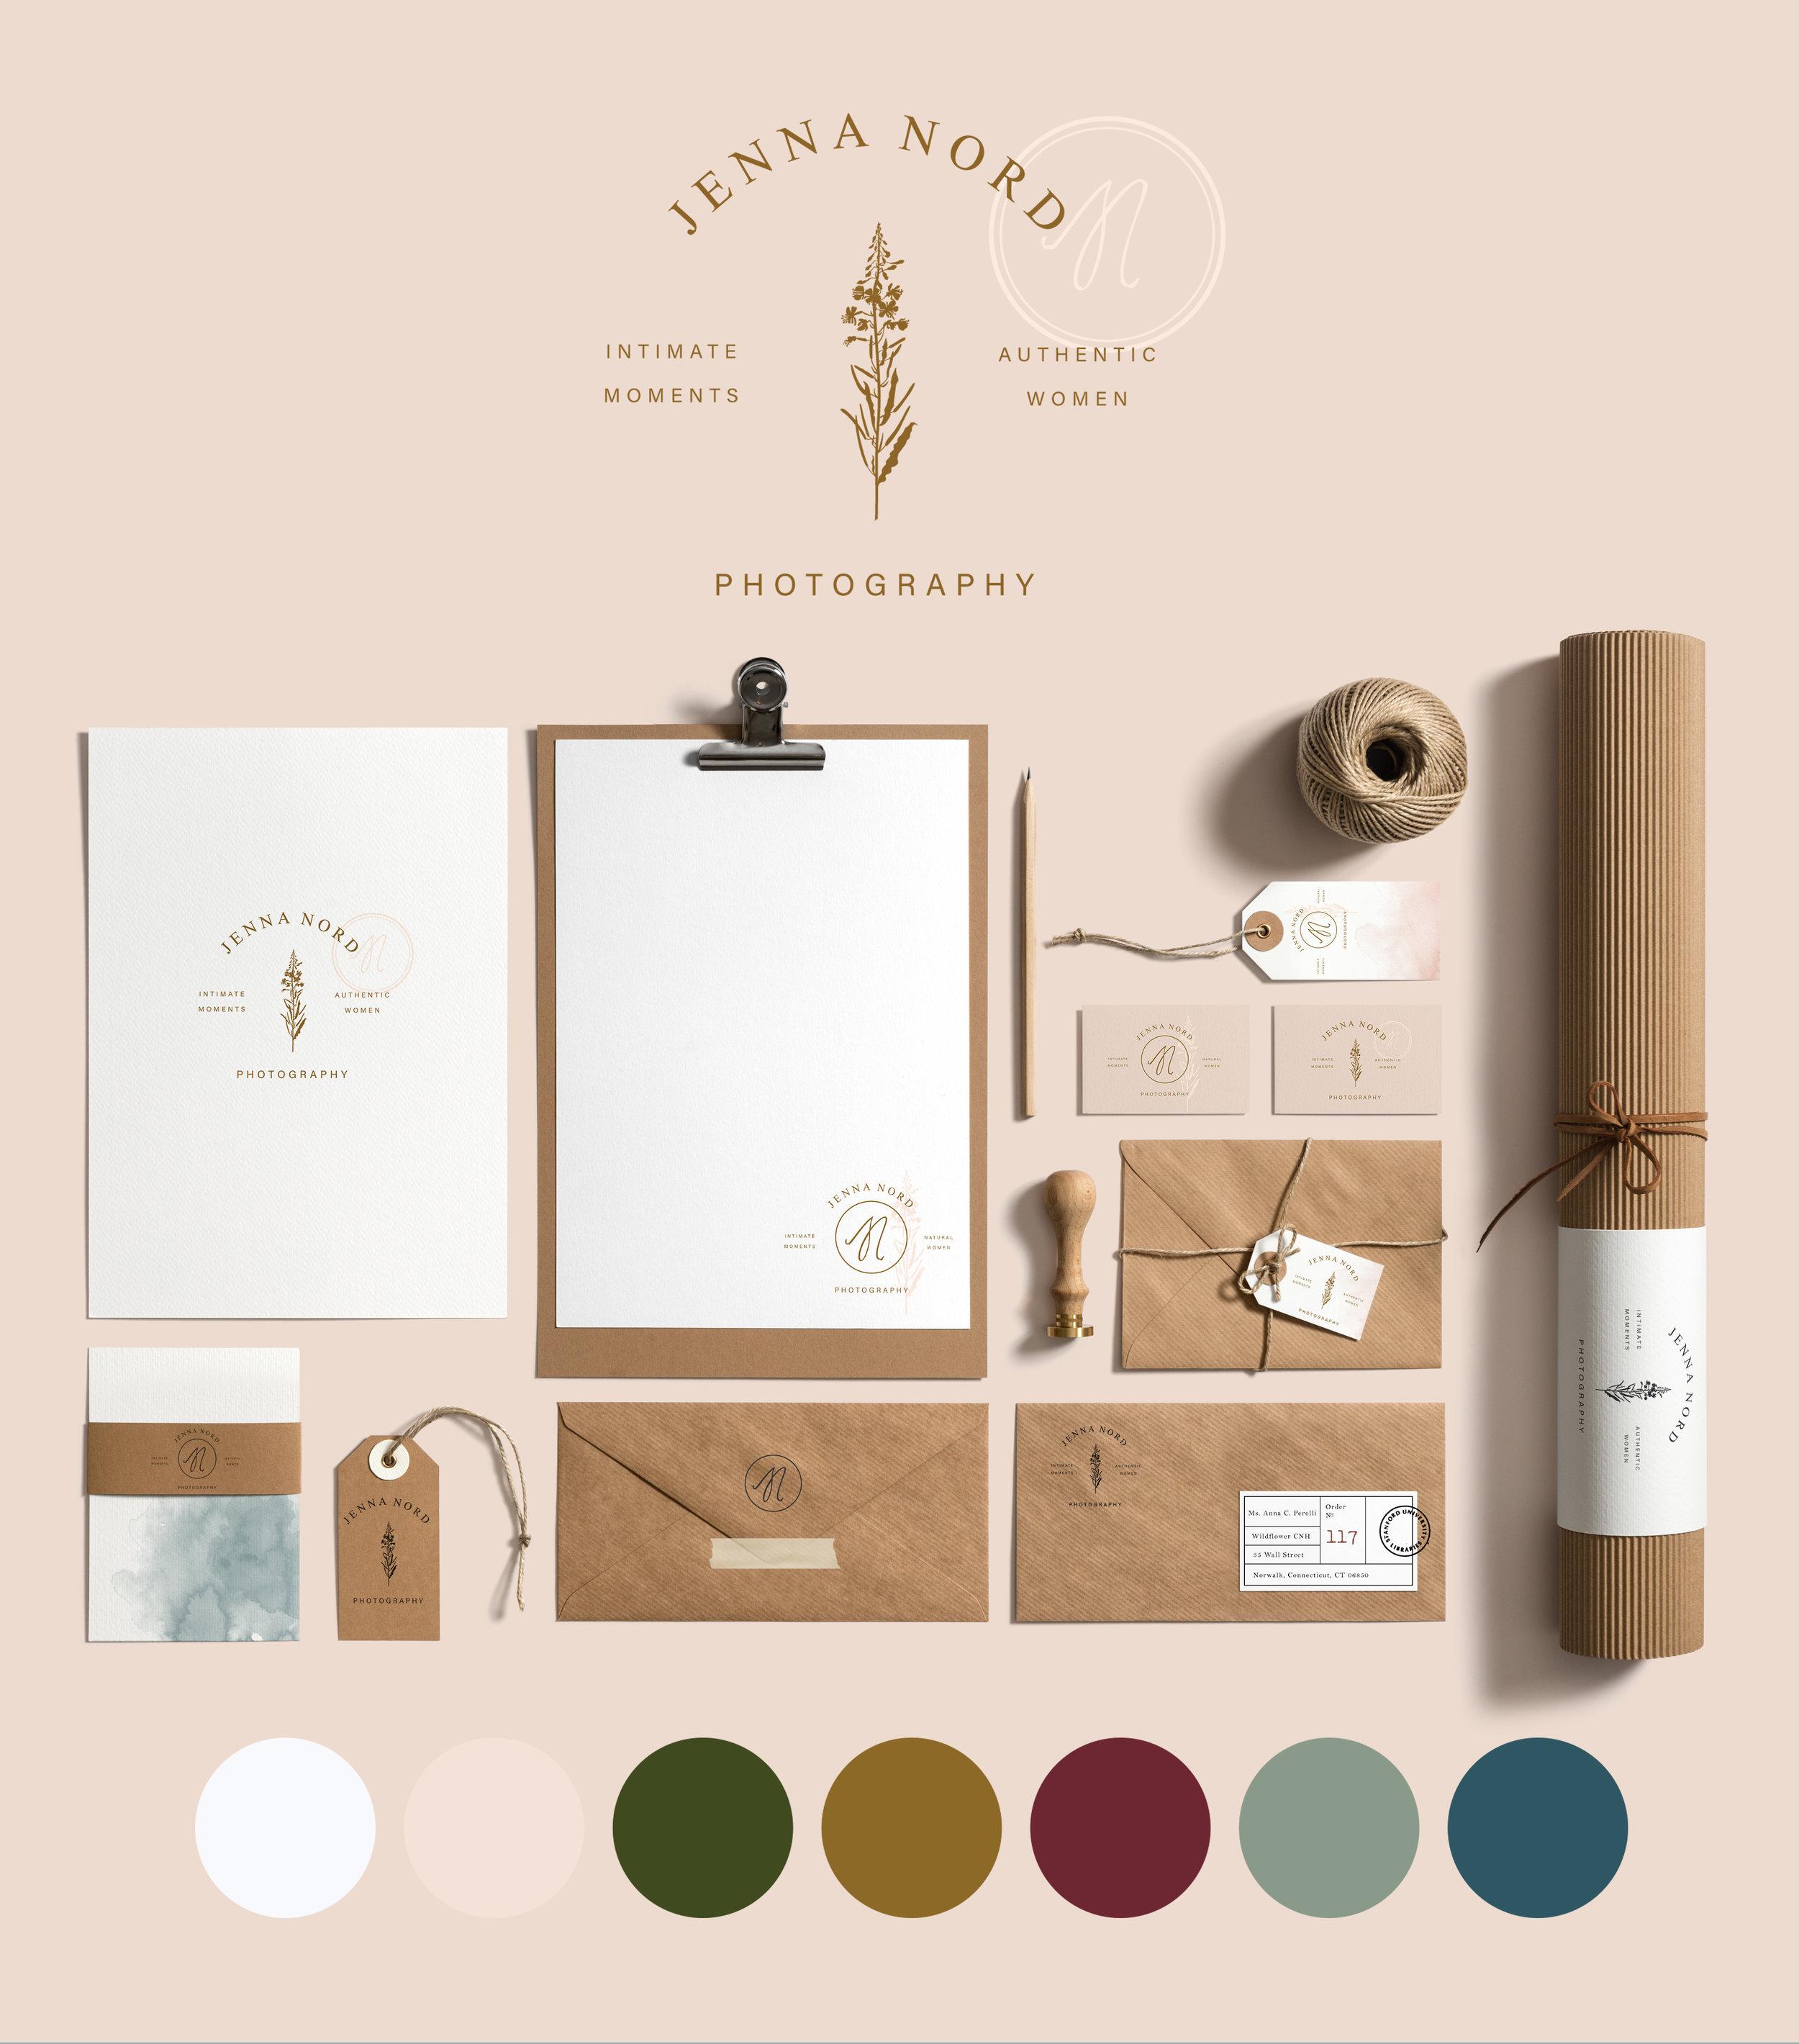 Jenna Nord Photography Branding + Identity Suite